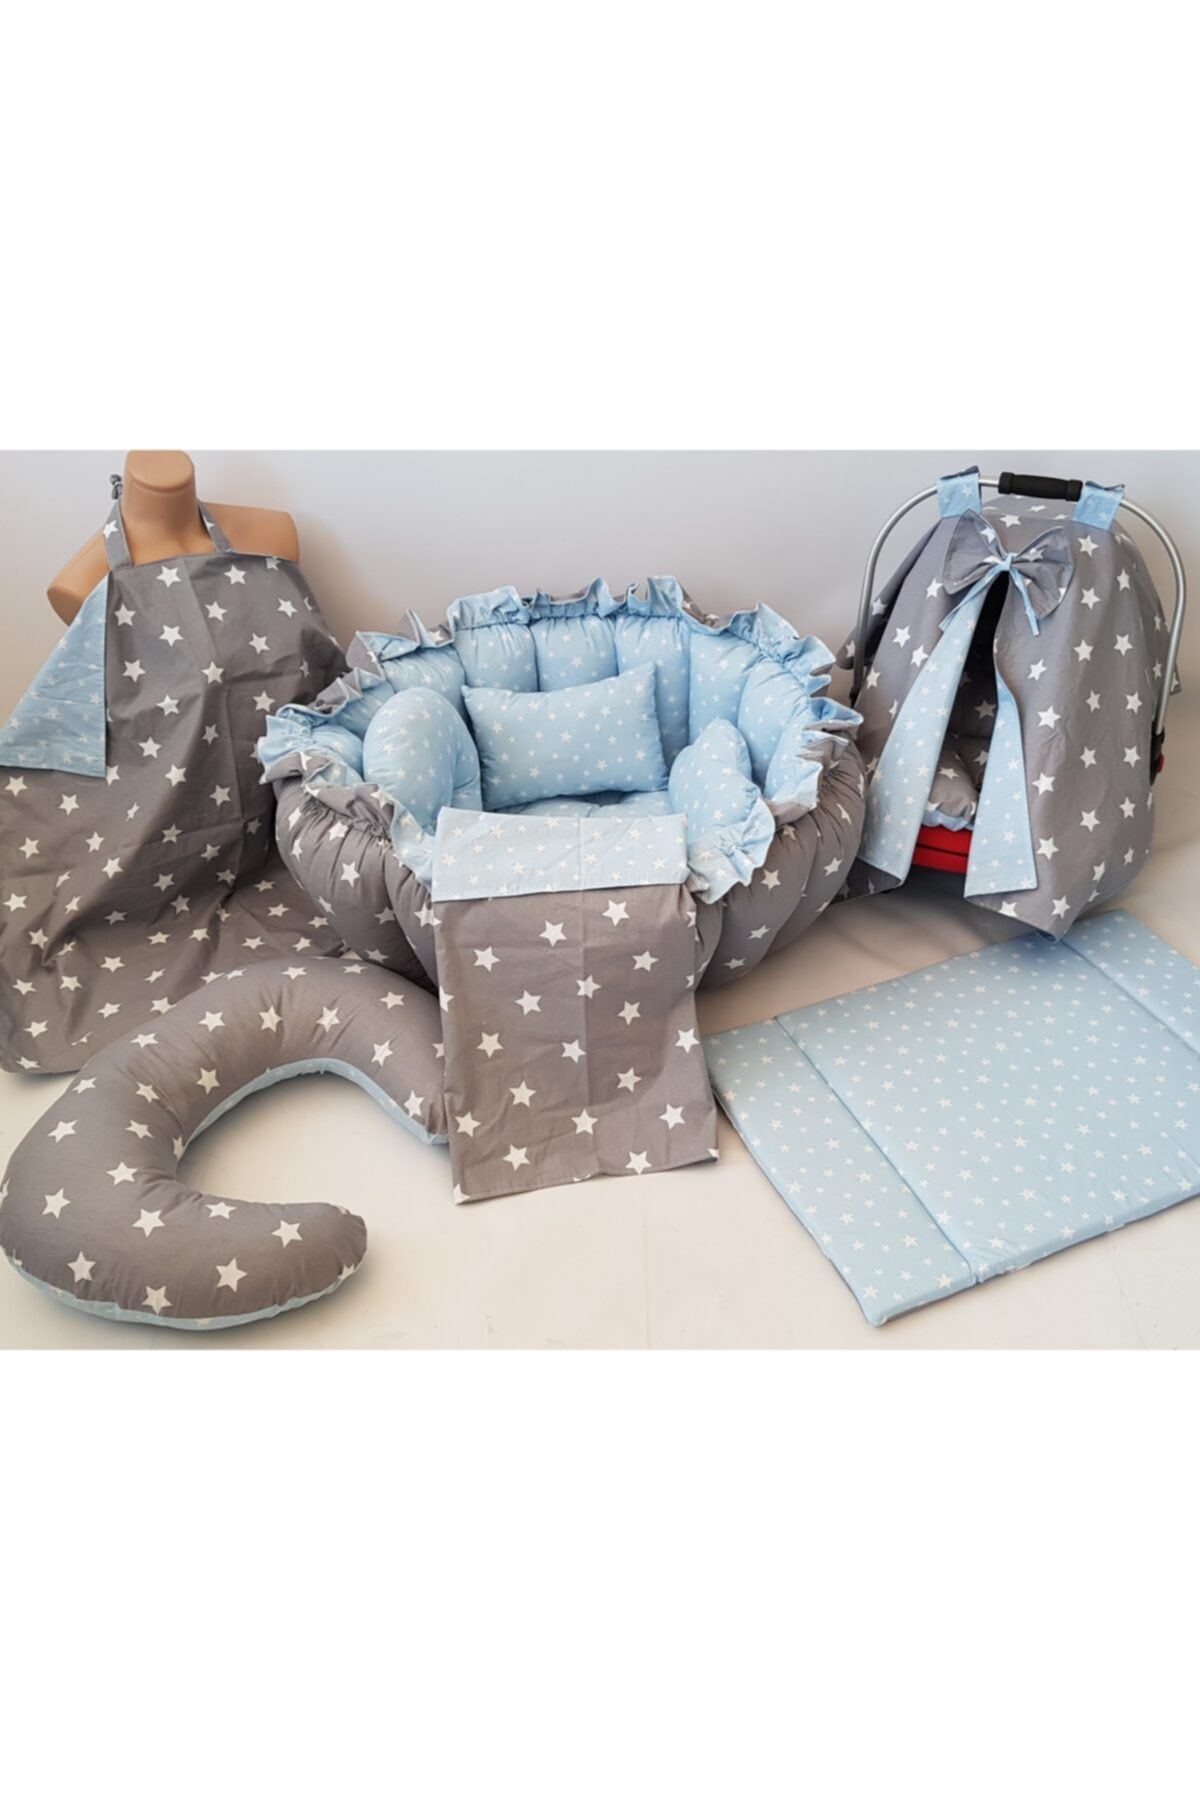 Mom Baby Babynest Set 10 Pieces - Mommy Baby Babynest Набор из 10 предметов